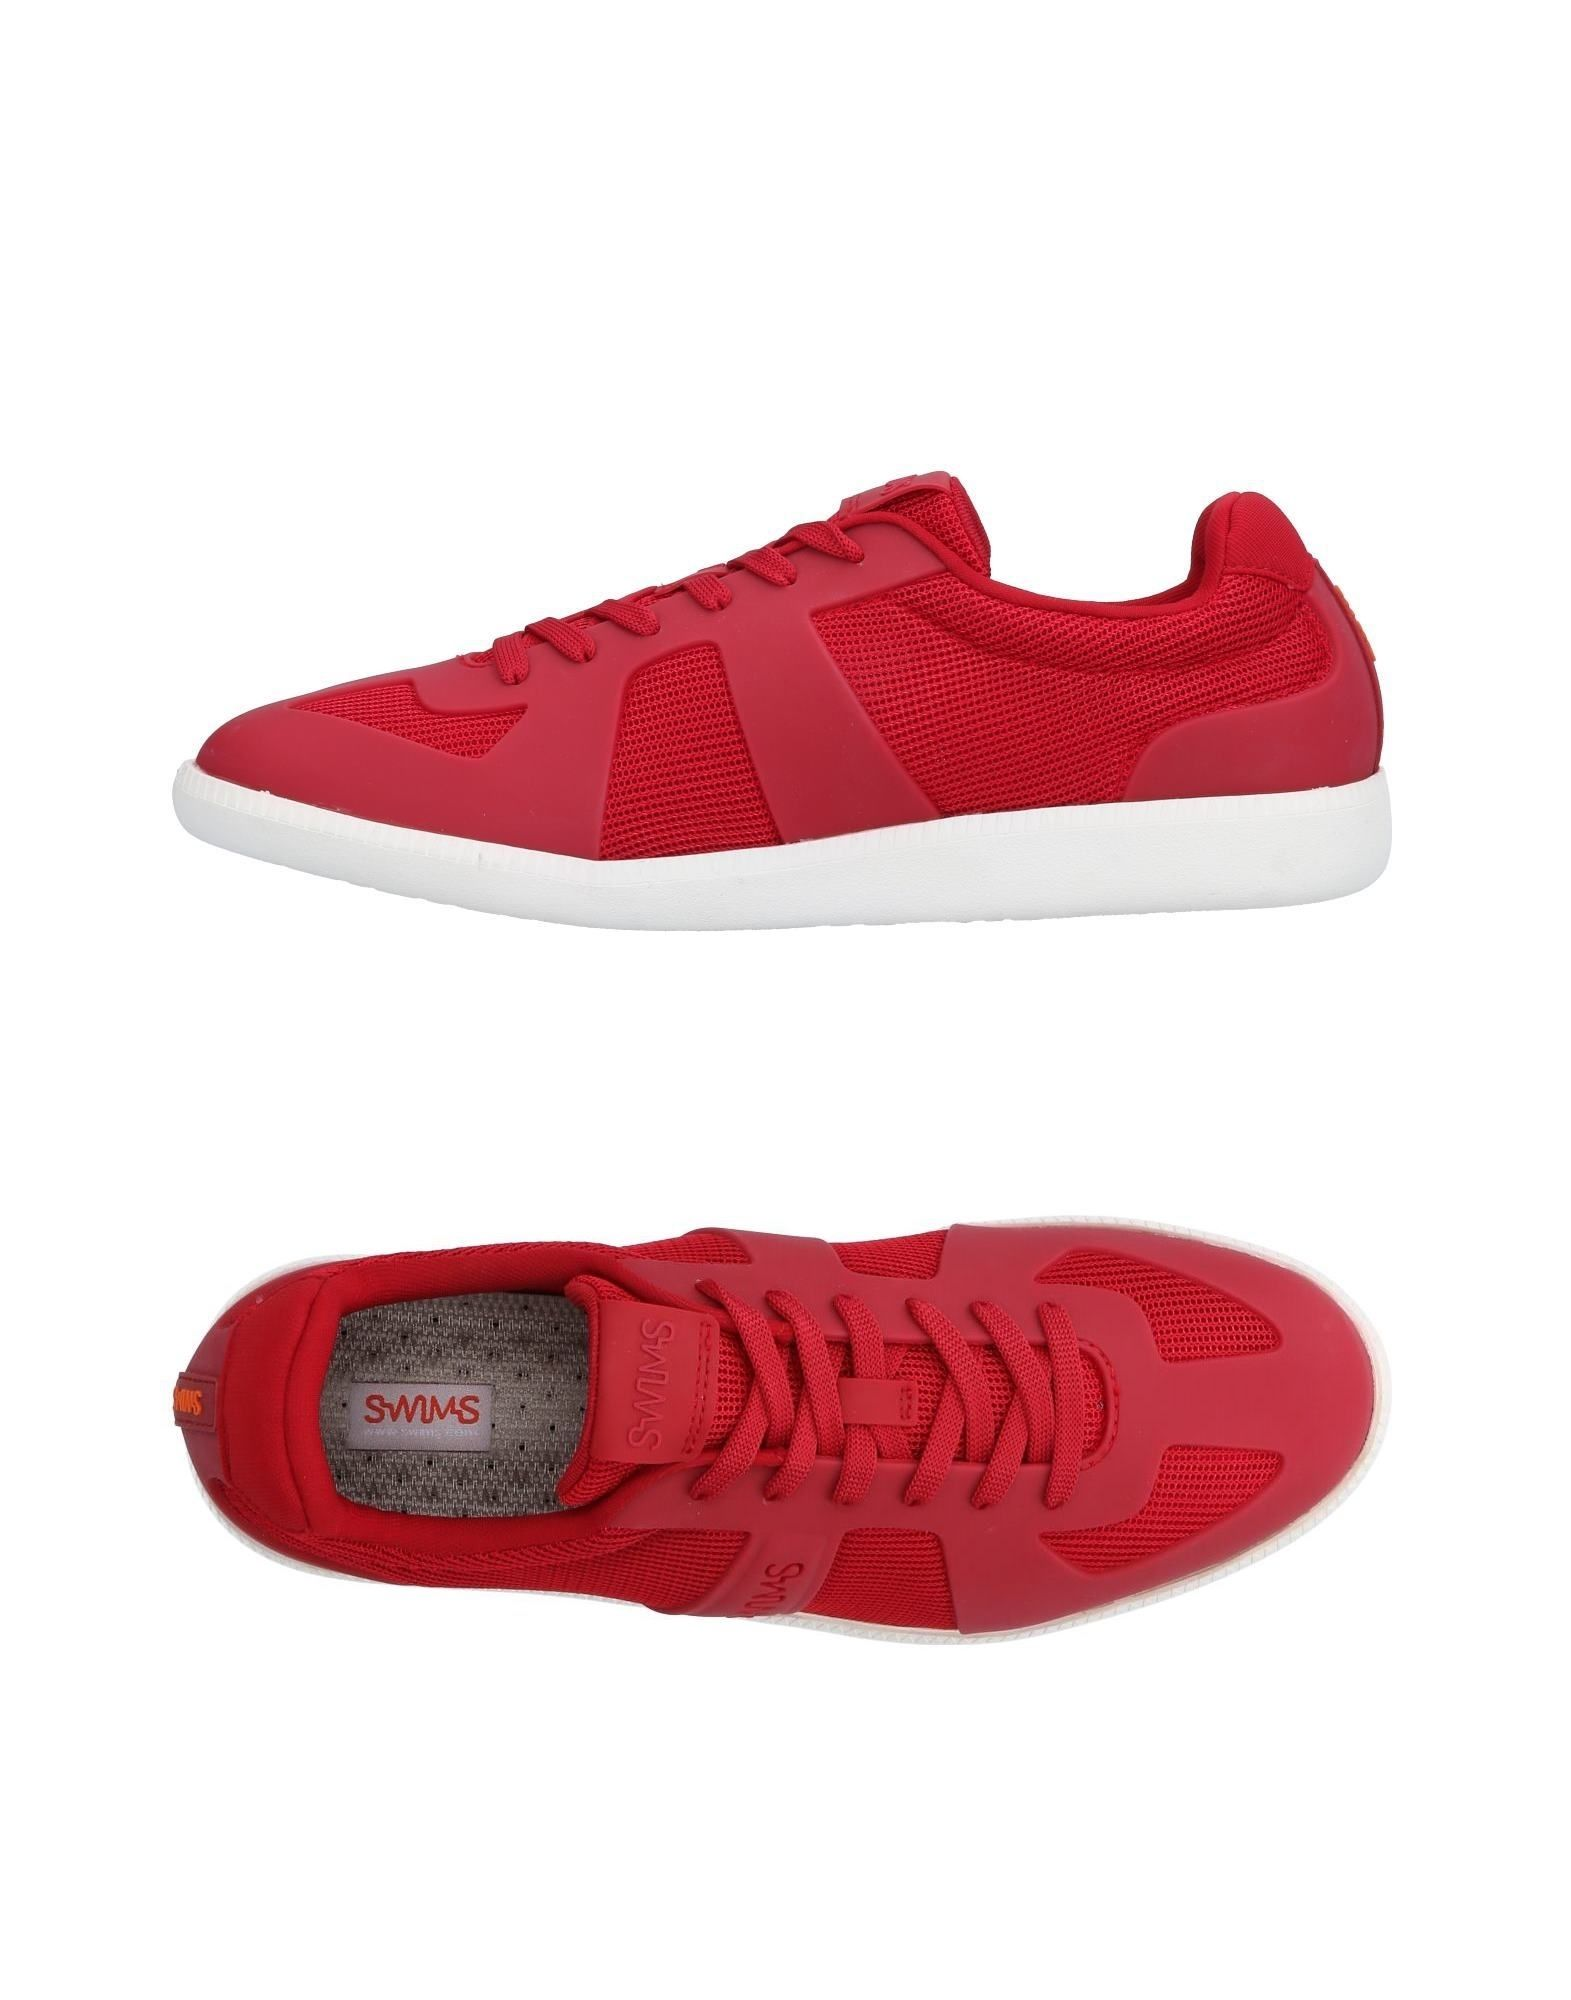 Sneakers Swims Uomo - Acquista online su YOOX - 11502091XT 808077c81ae